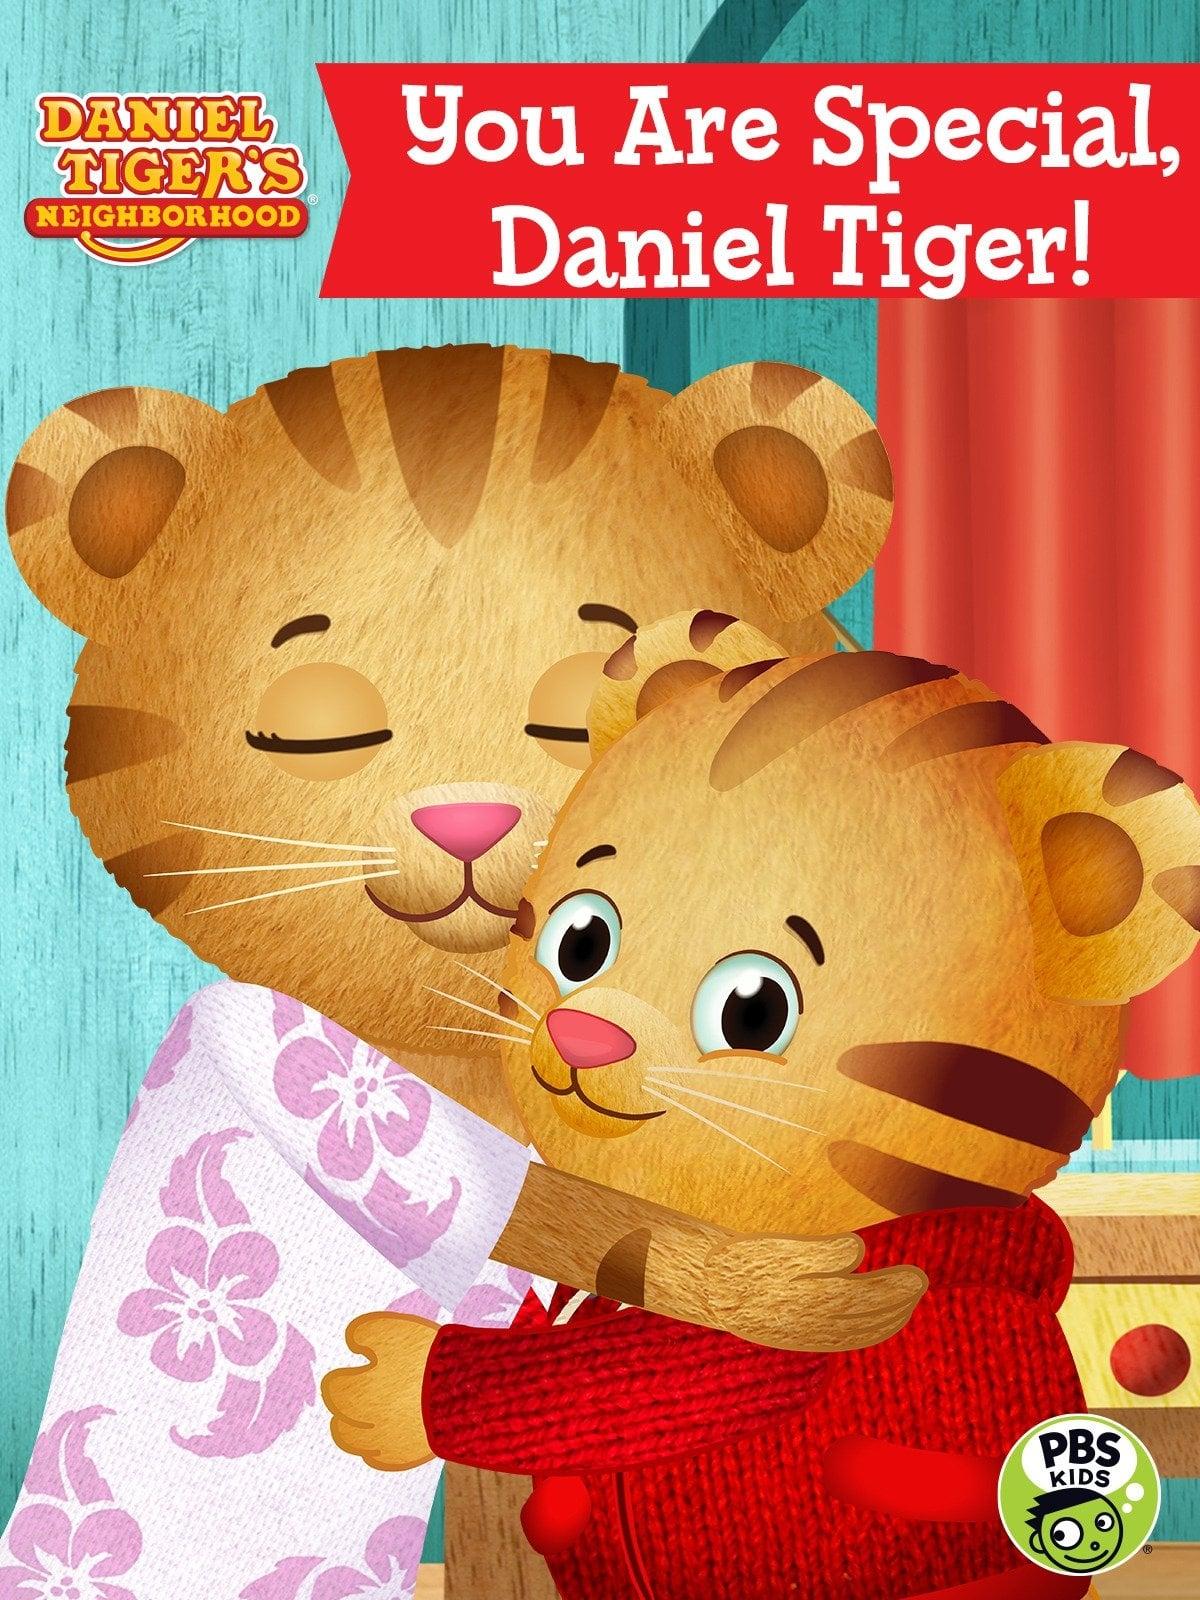 Daniel Tiger's Neighborhood: You Are Special, Daniel Tiger!